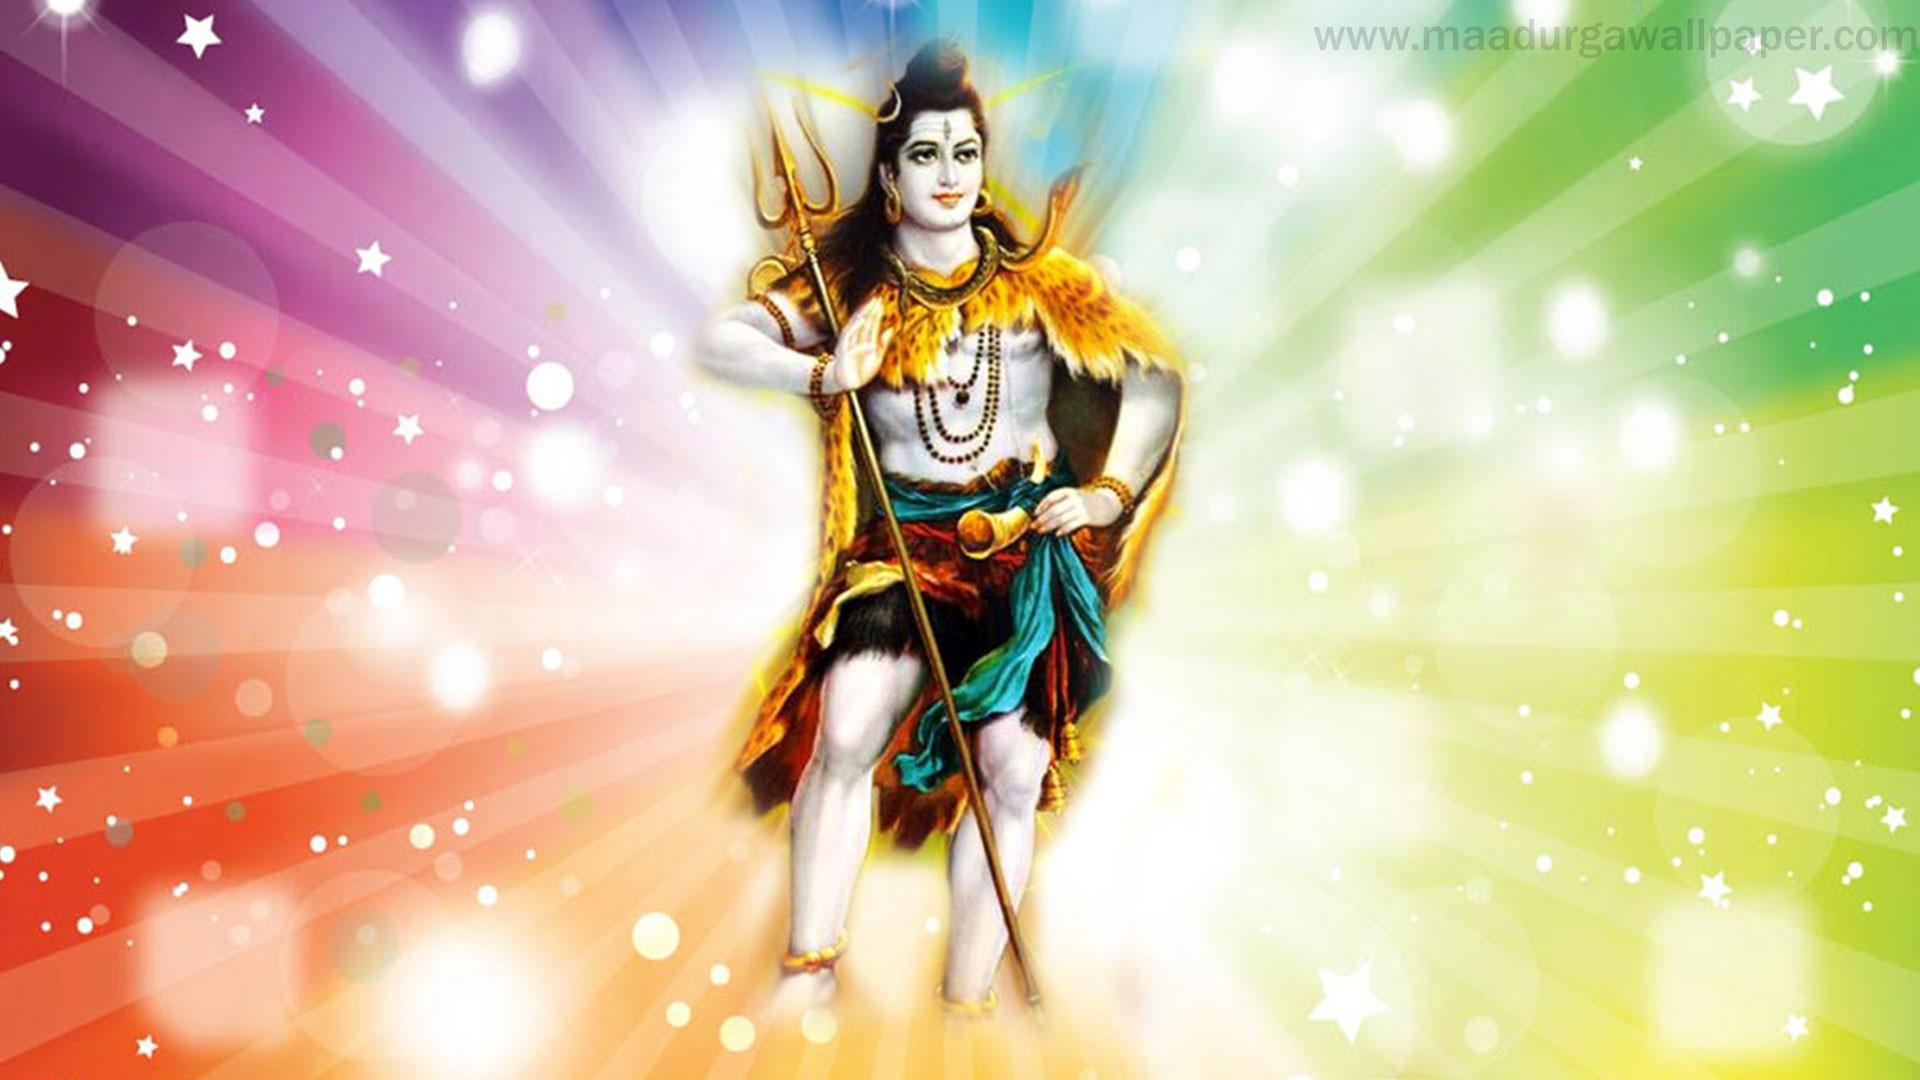 1080p Images Full Hd 1080p Parshuram Hd Photo Download